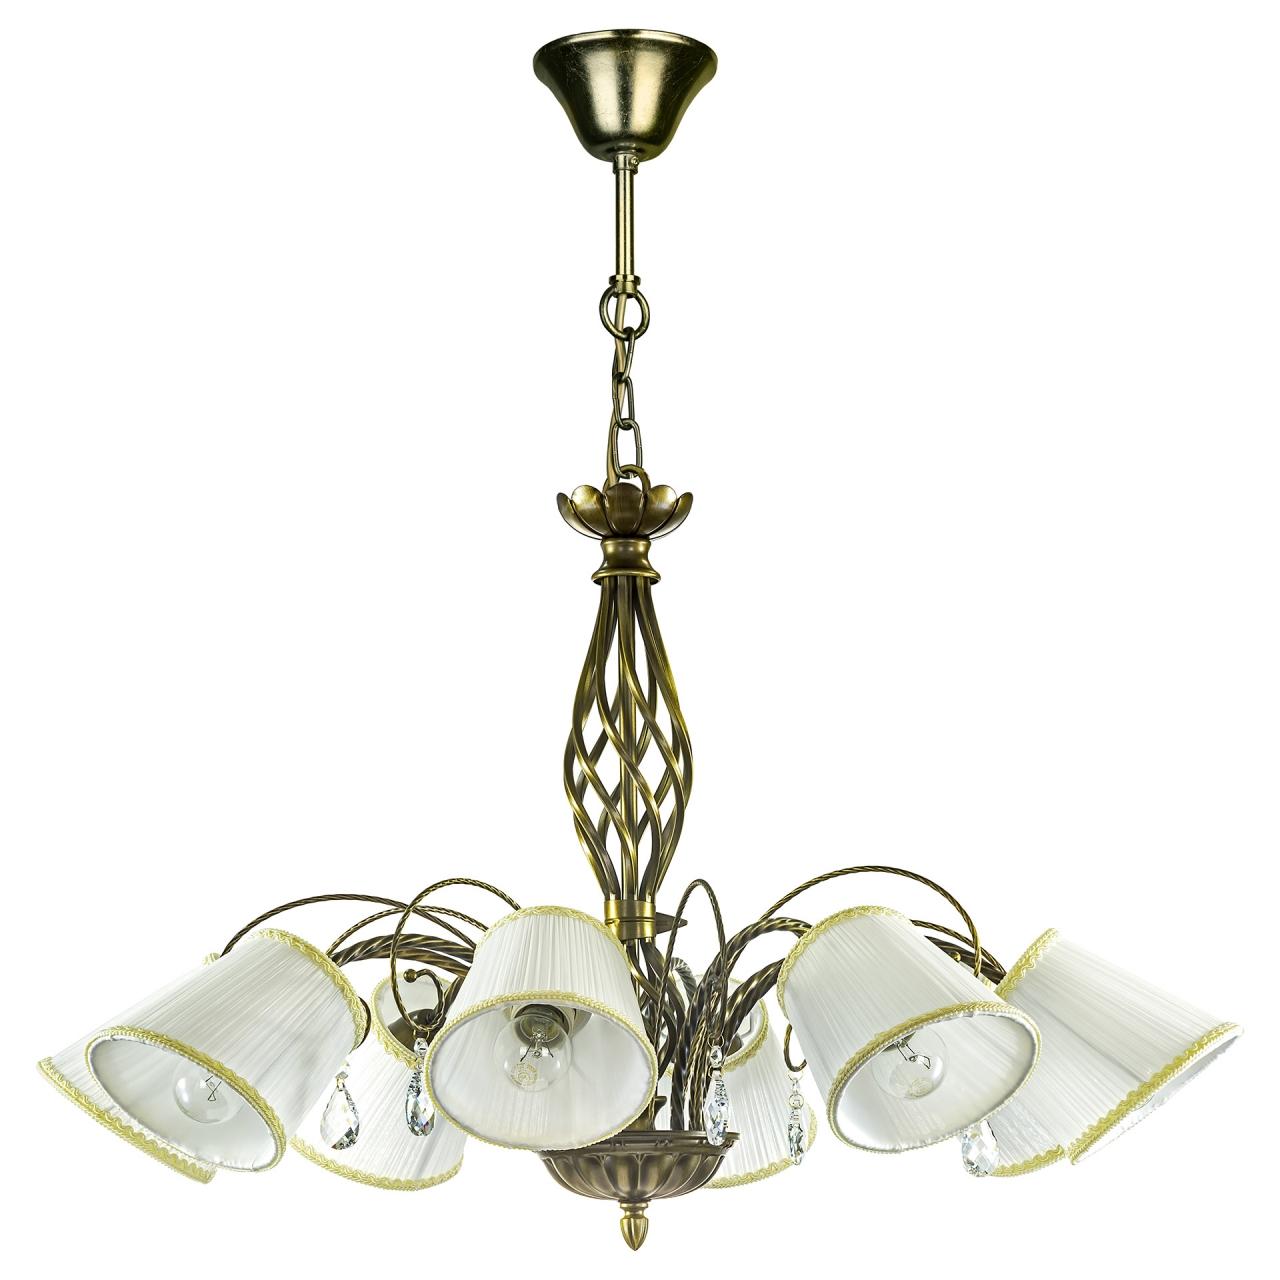 Люстра подвесная Esedra 8x40W E27 bronze ткань Lightstar 796181